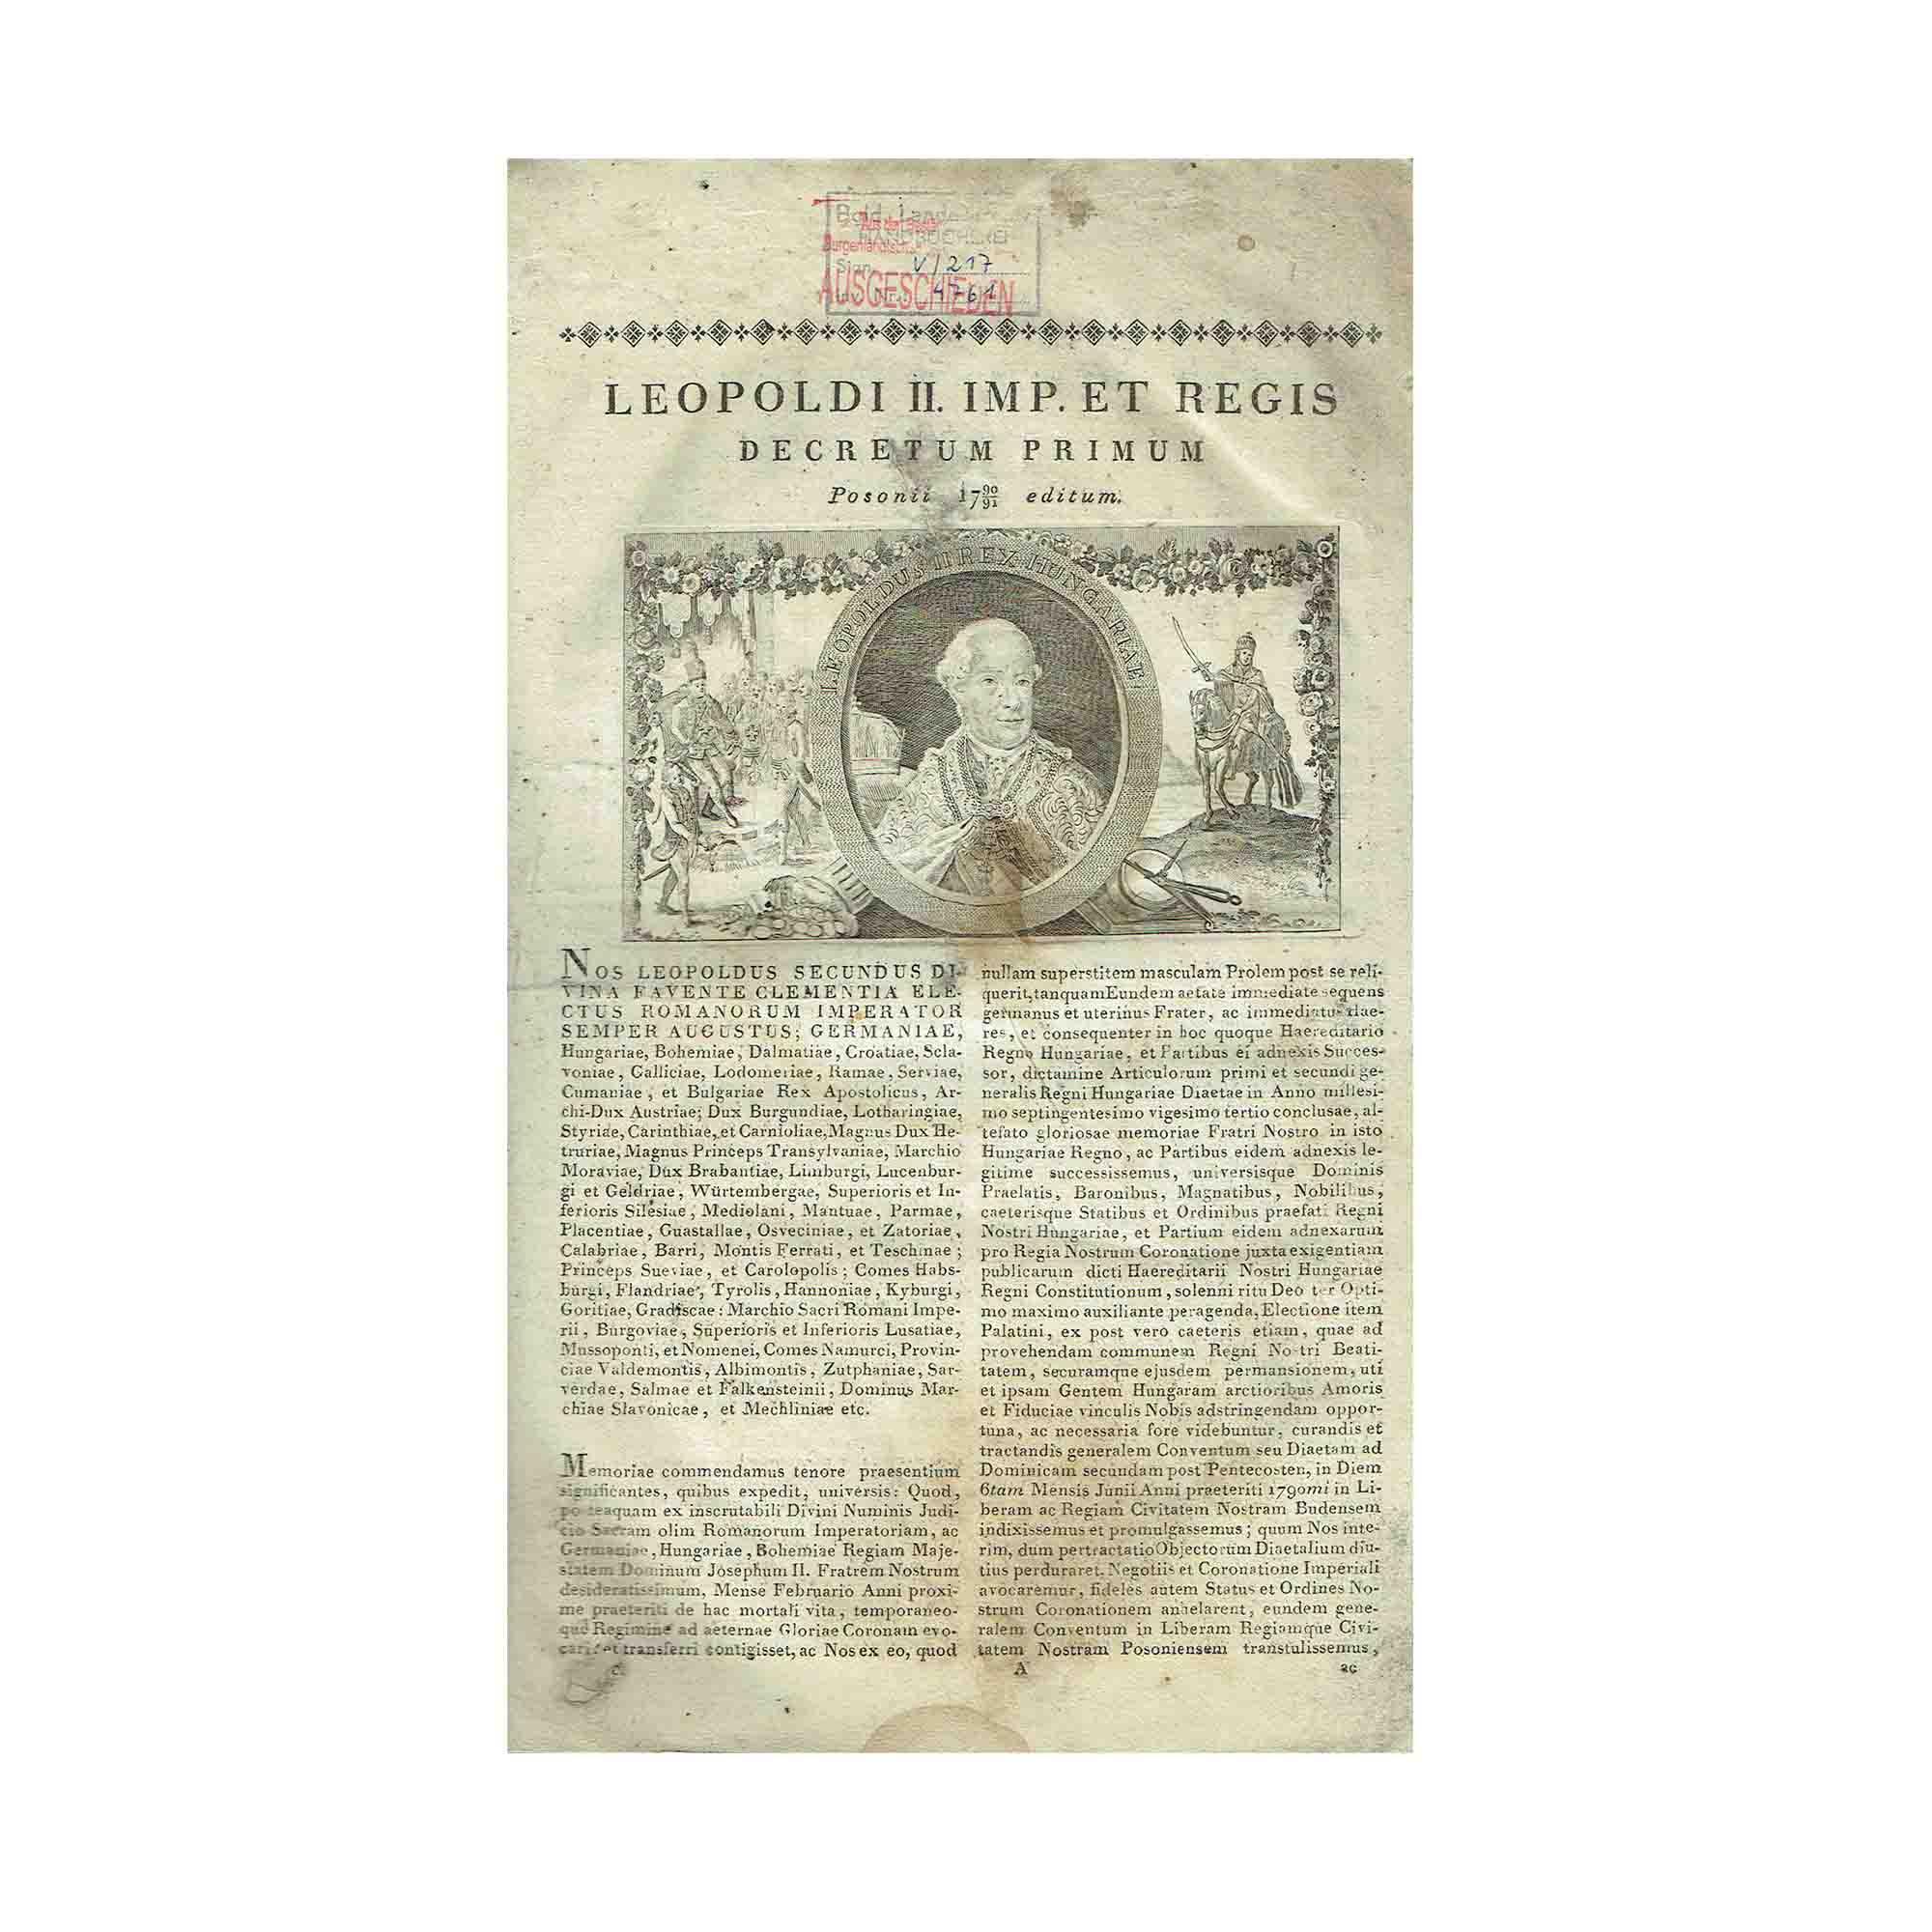 5336-Leopold-II-Franz-II-Articuli-Decretales-1790-1812-1-N.jpg